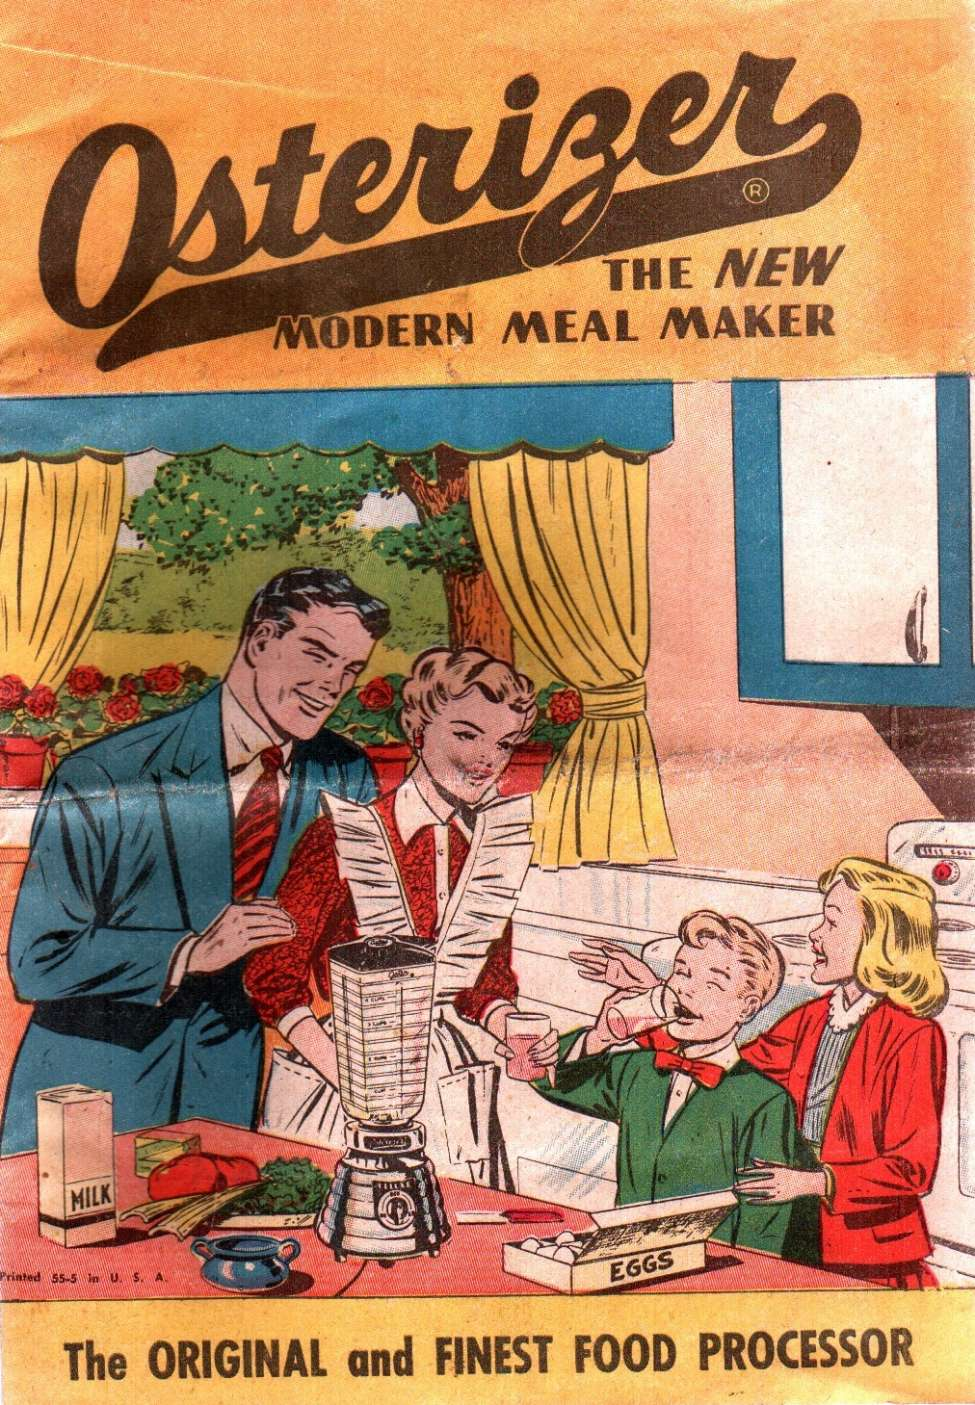 Modern Book Cover Generator : Osterizer the new modern meal maker nn comic book plus